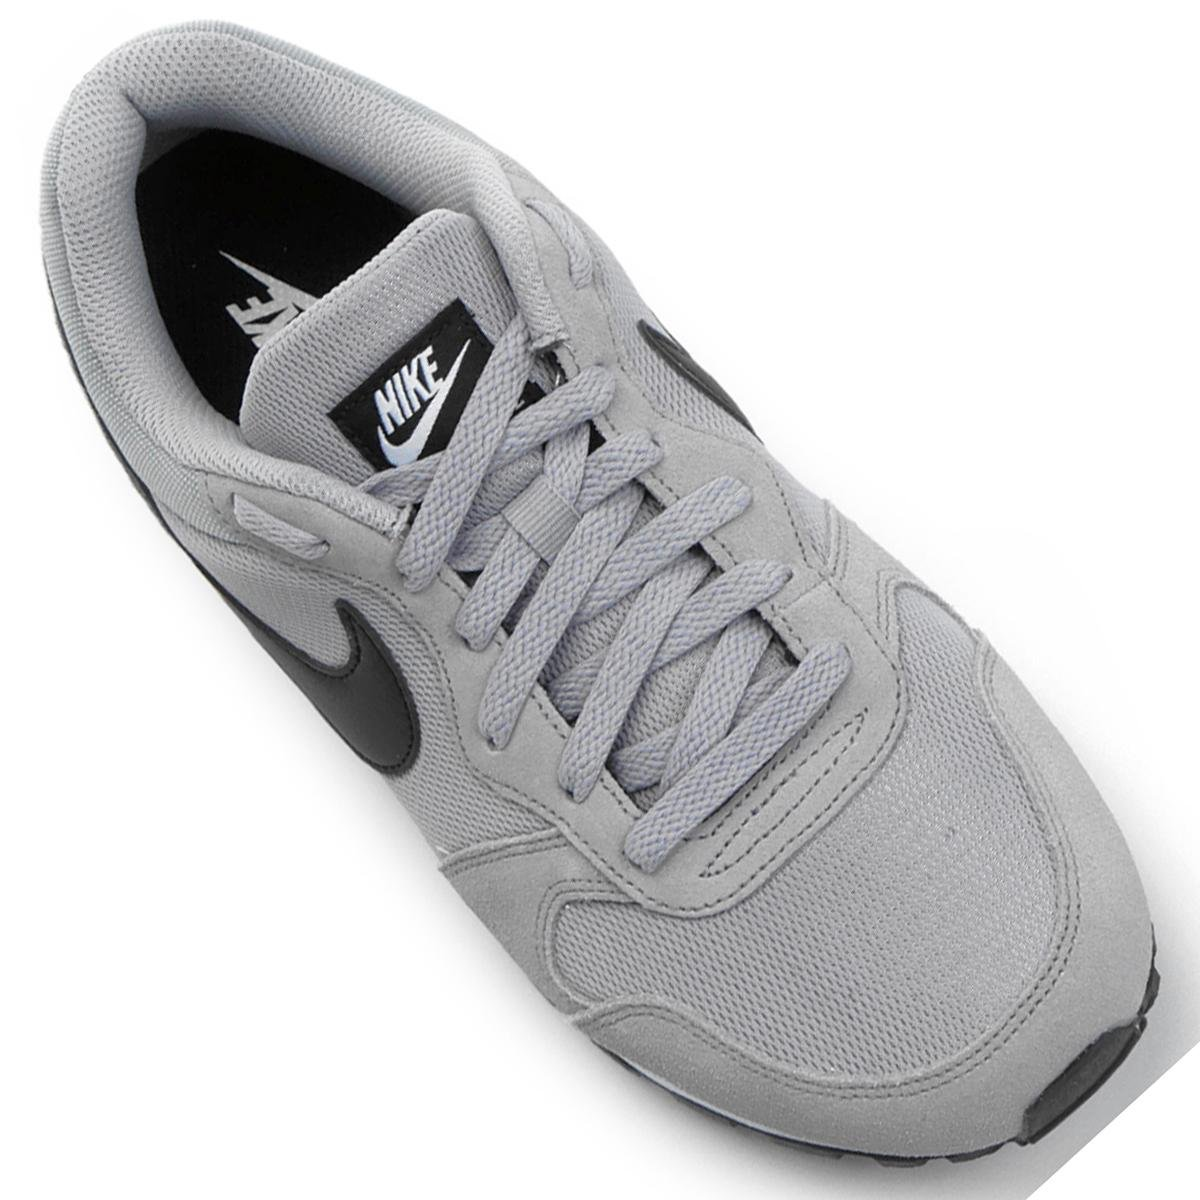 Tênis Nike Md Runner 2 Masculino - Tam: 44 - 3